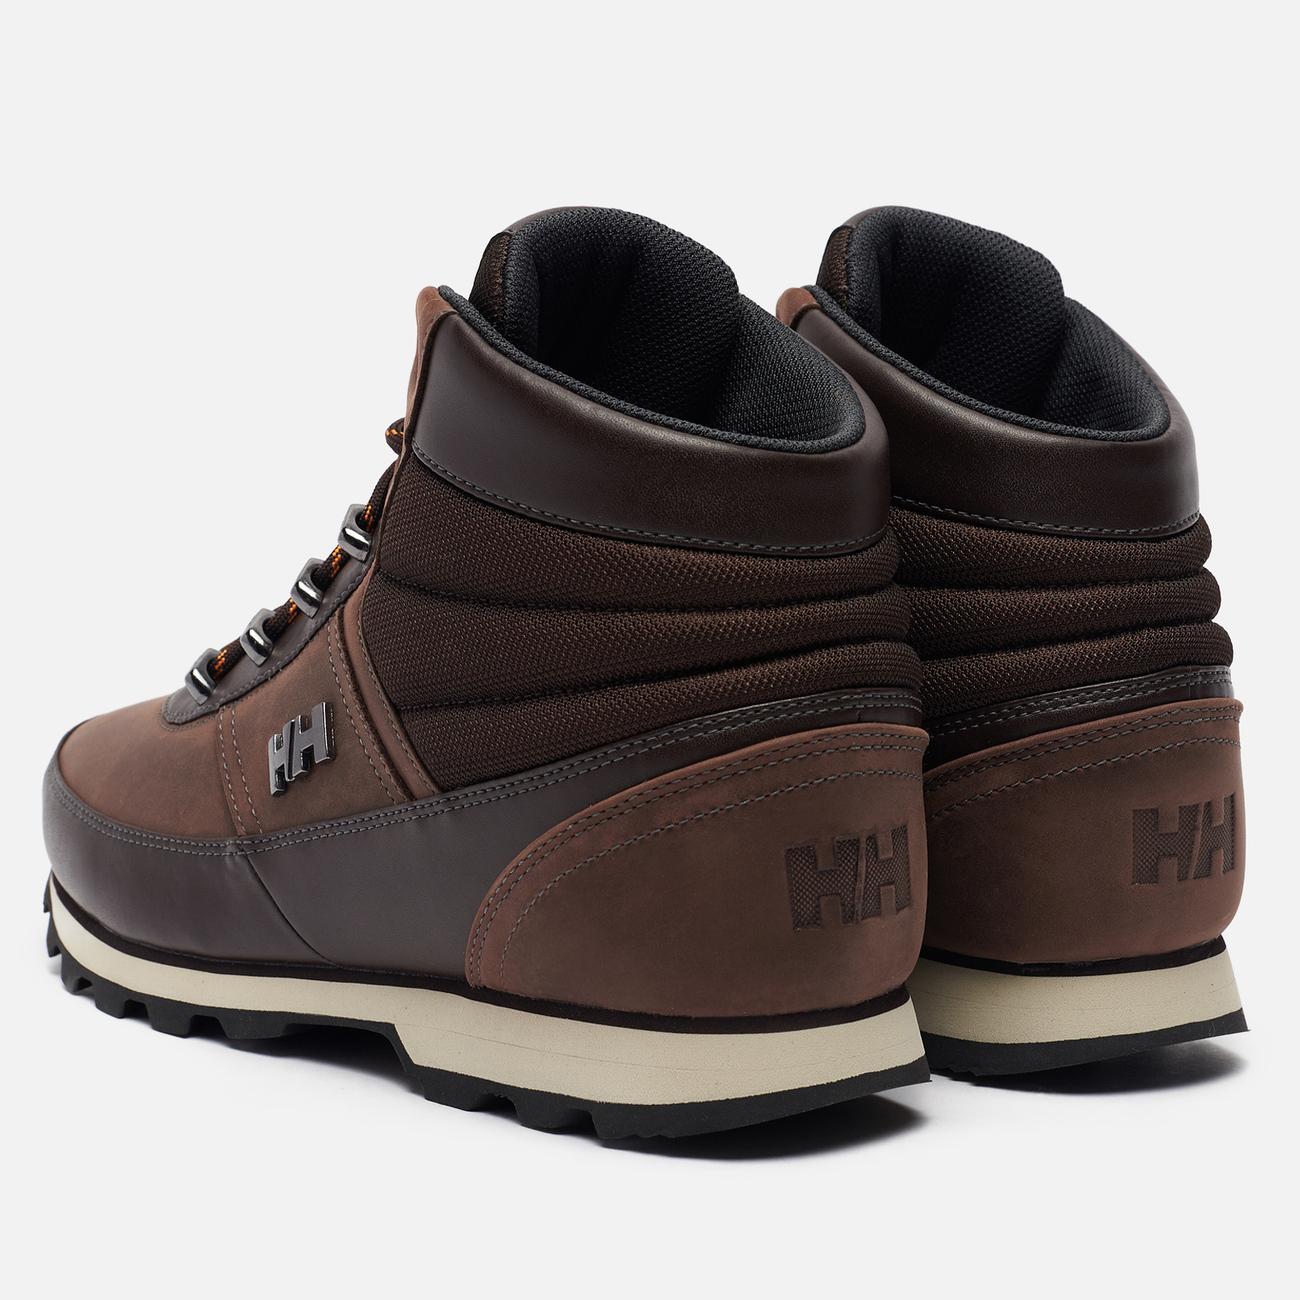 Мужские зимние ботинки Helly Hansen Woodlands Coffee Bean